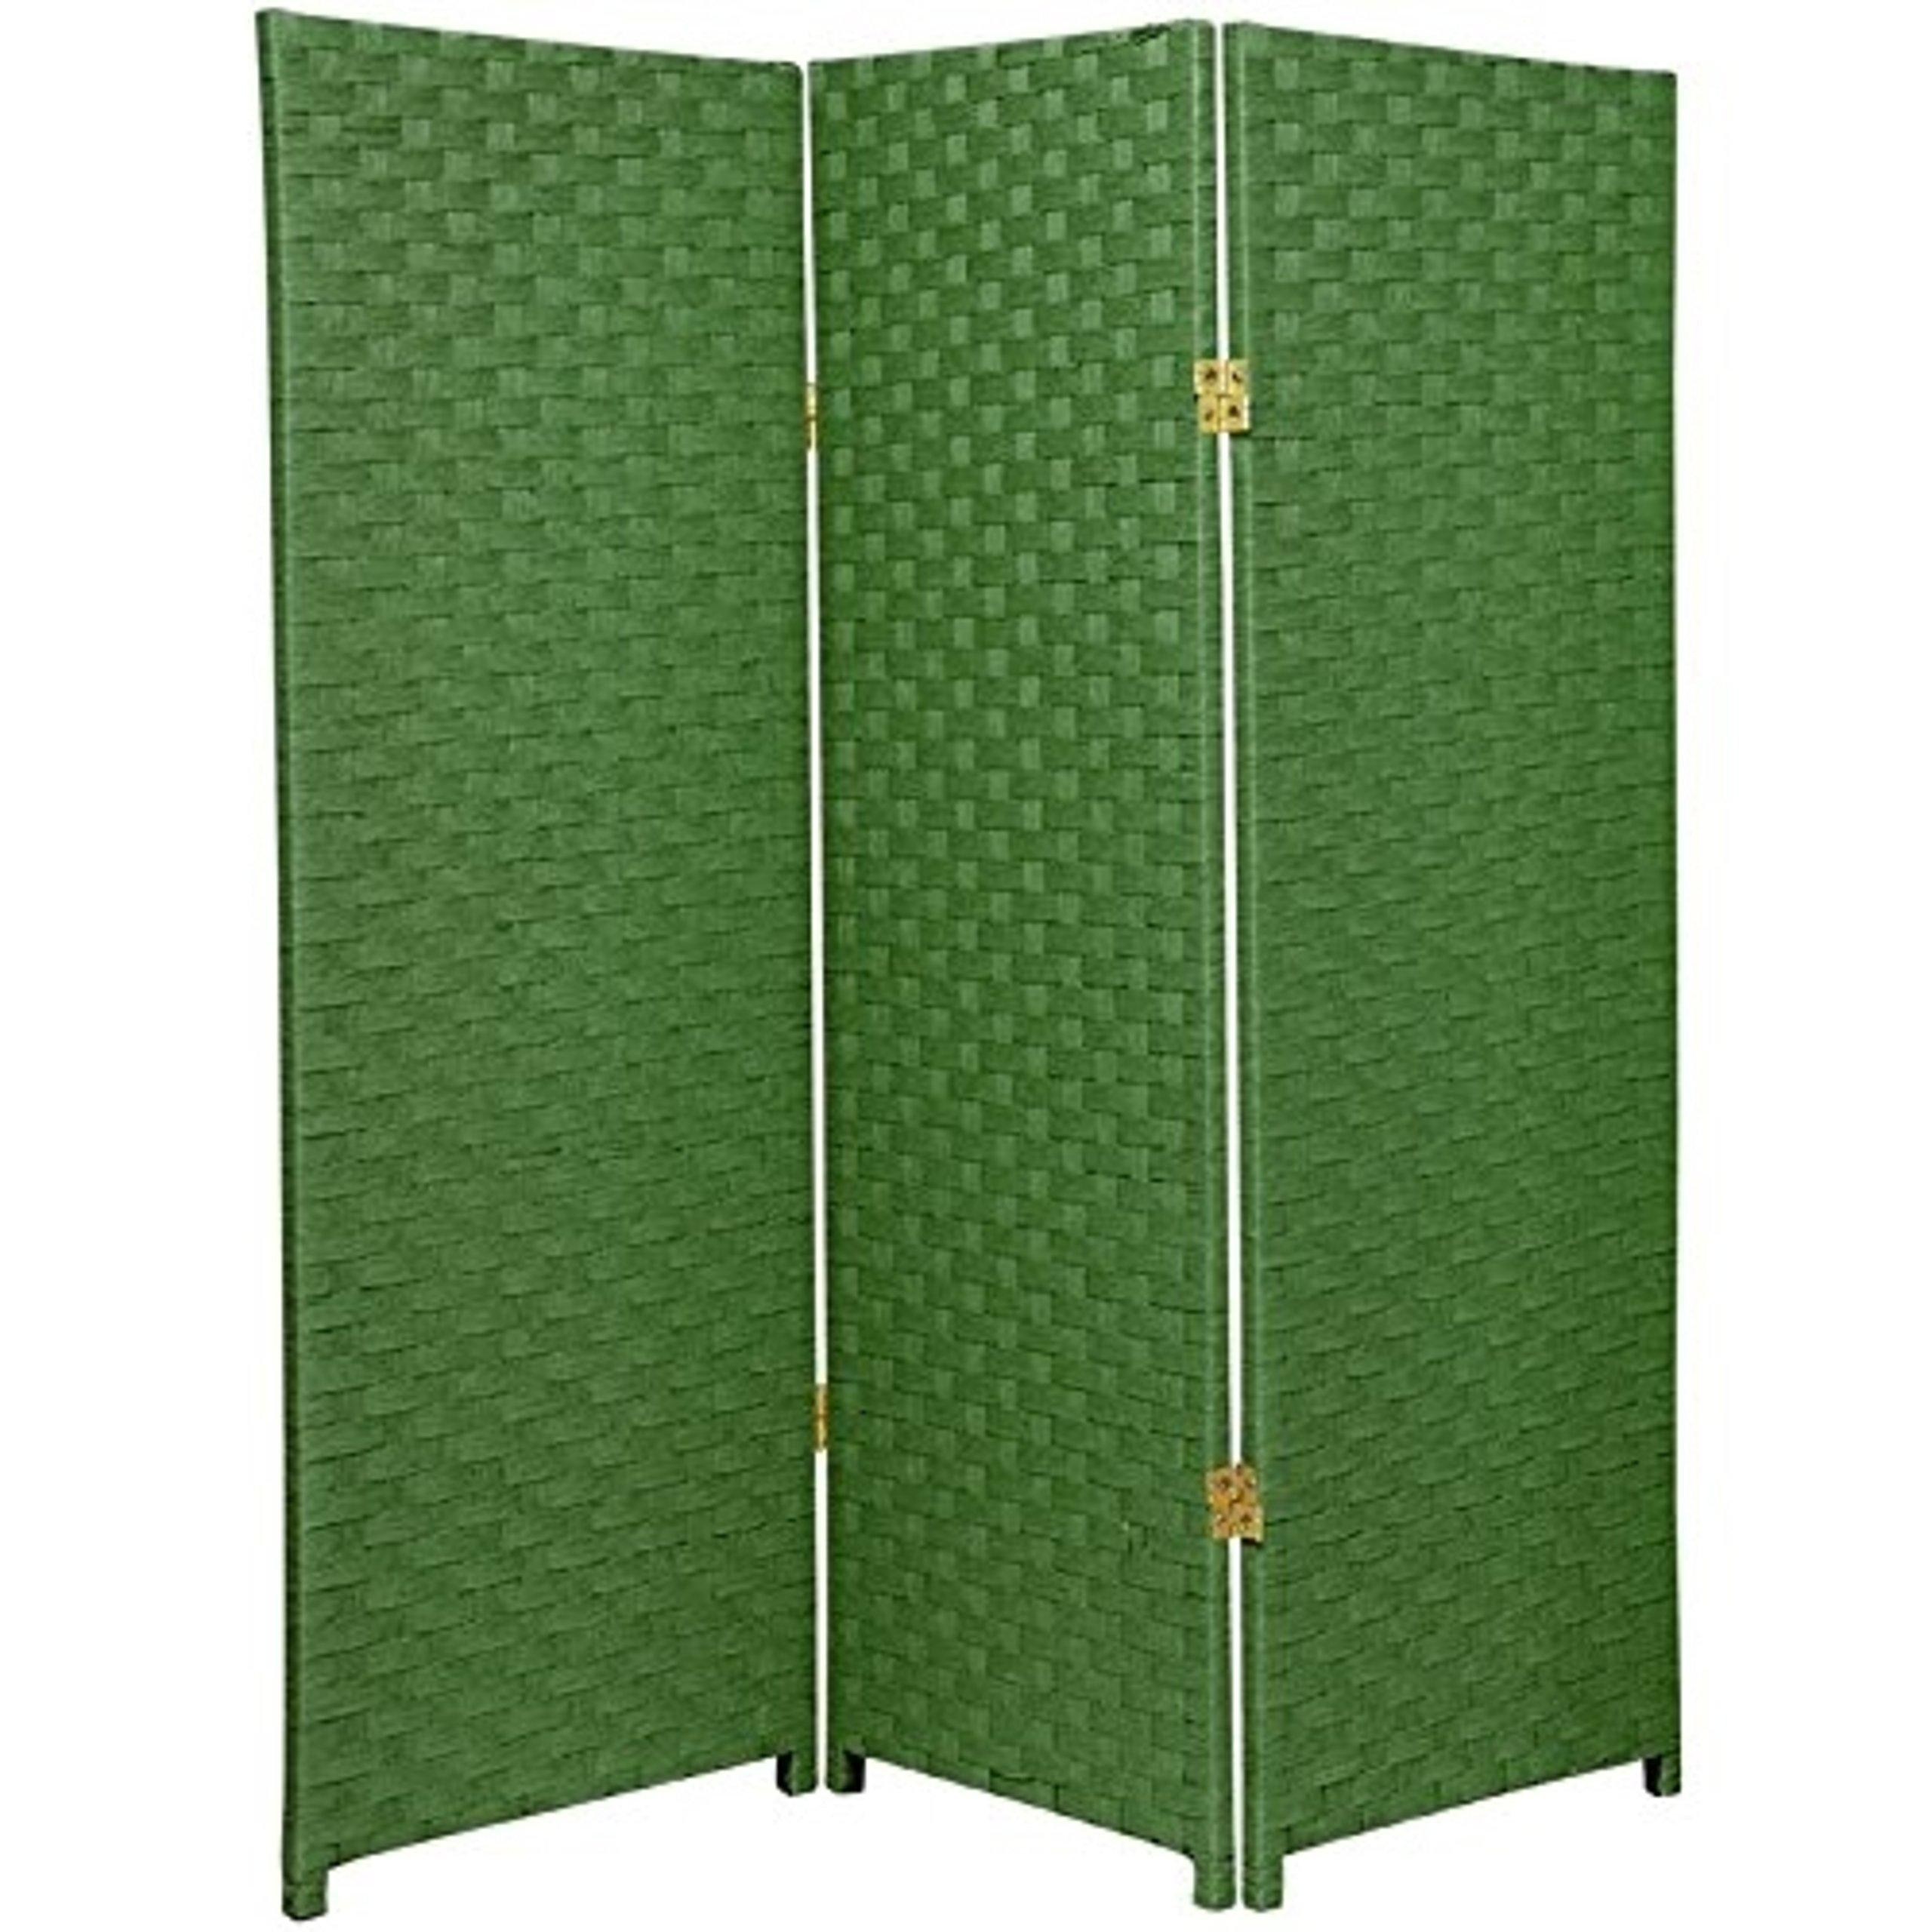 Natural Plant Fiber Woven Room Decor Light Green 3 Panels Divider